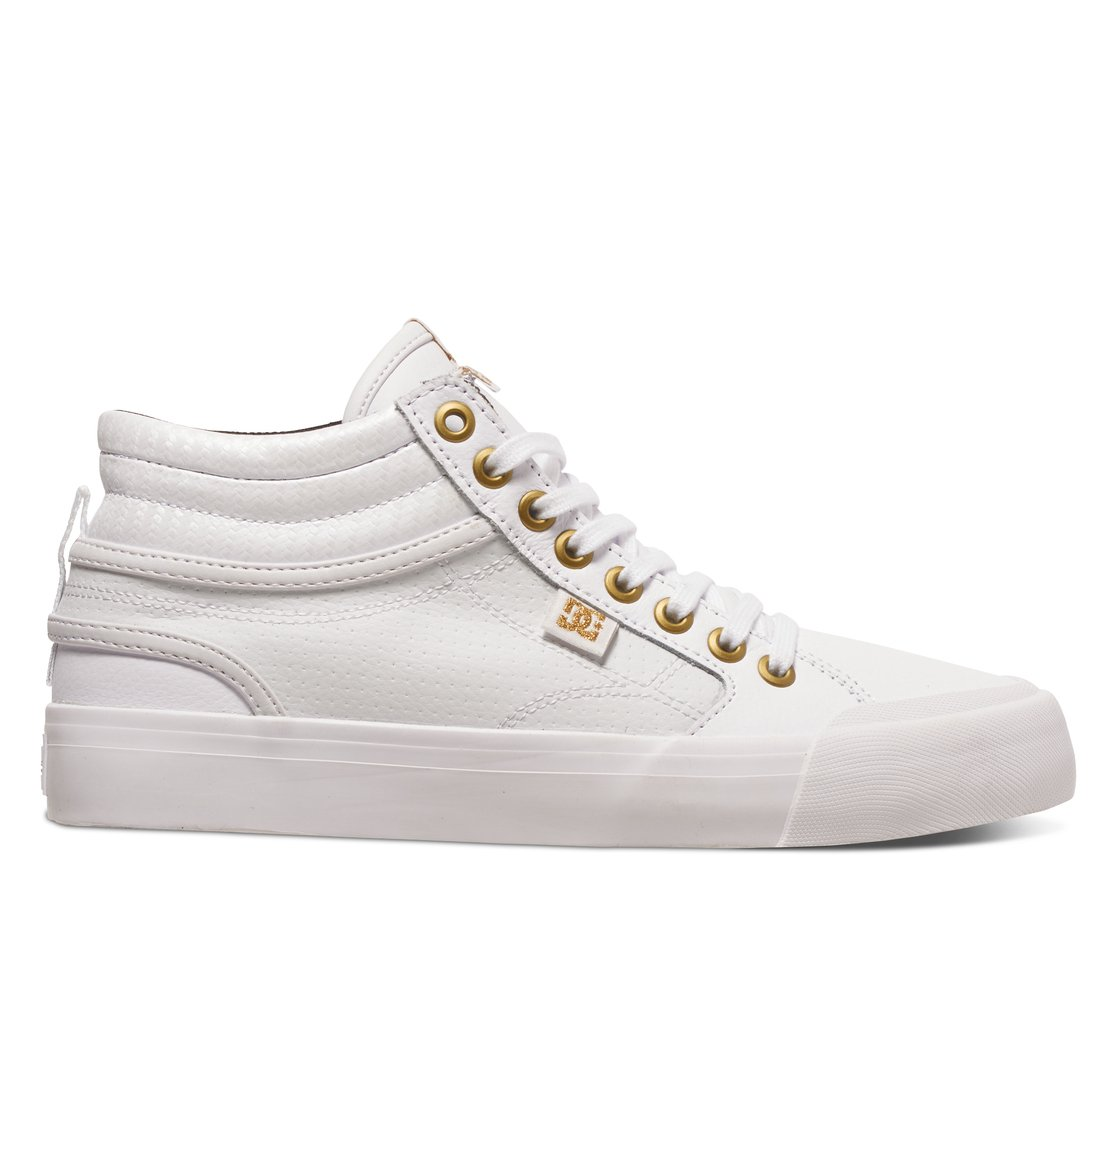 d1d20bf30298 0 Evan Hi - High-Top Shoes for Women ADJS300147 DC Shoes